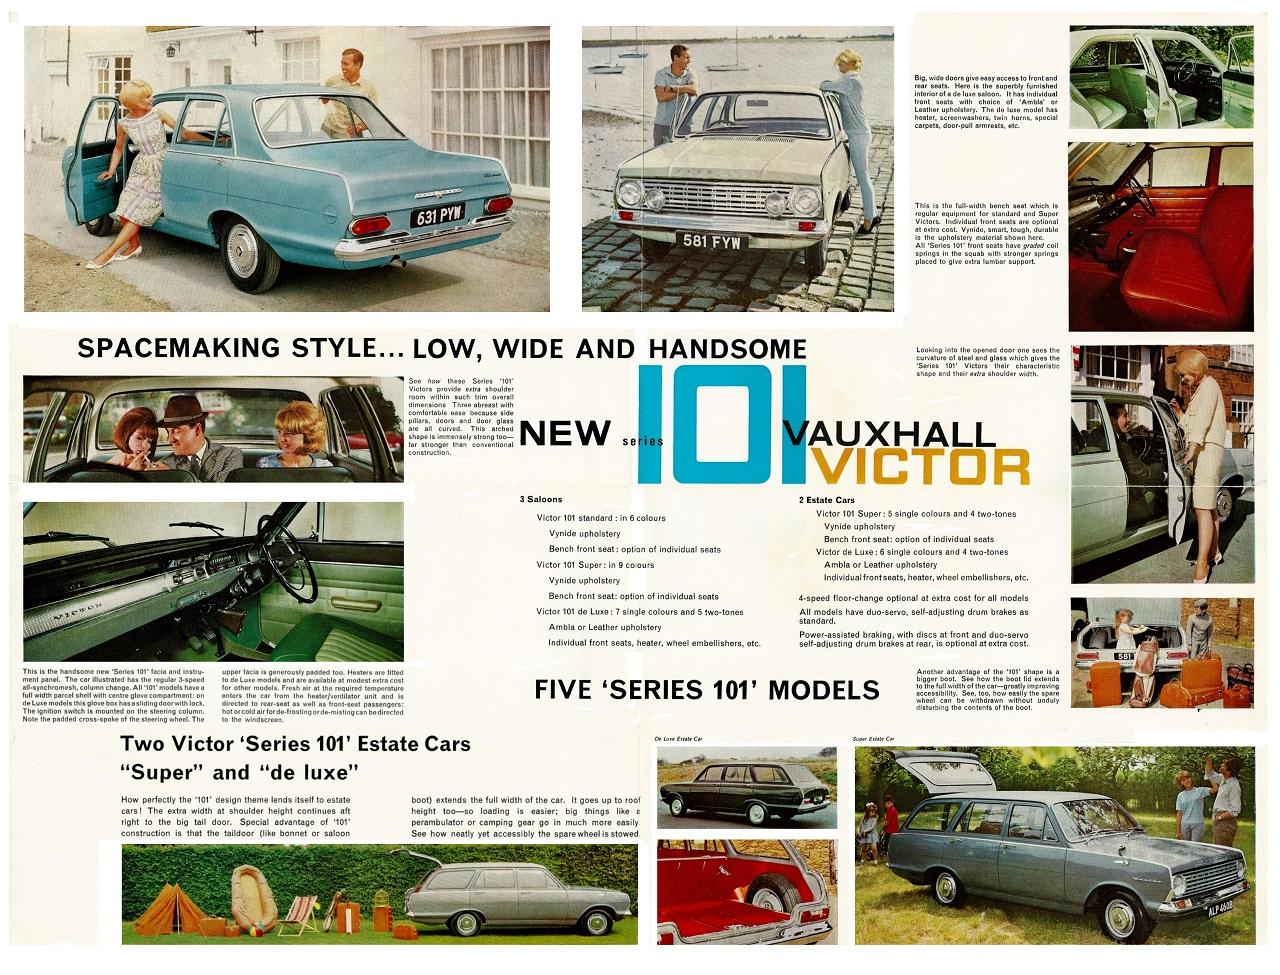 Vauxhall Fc Victor 101 Vx4 90 Brochures Advertising